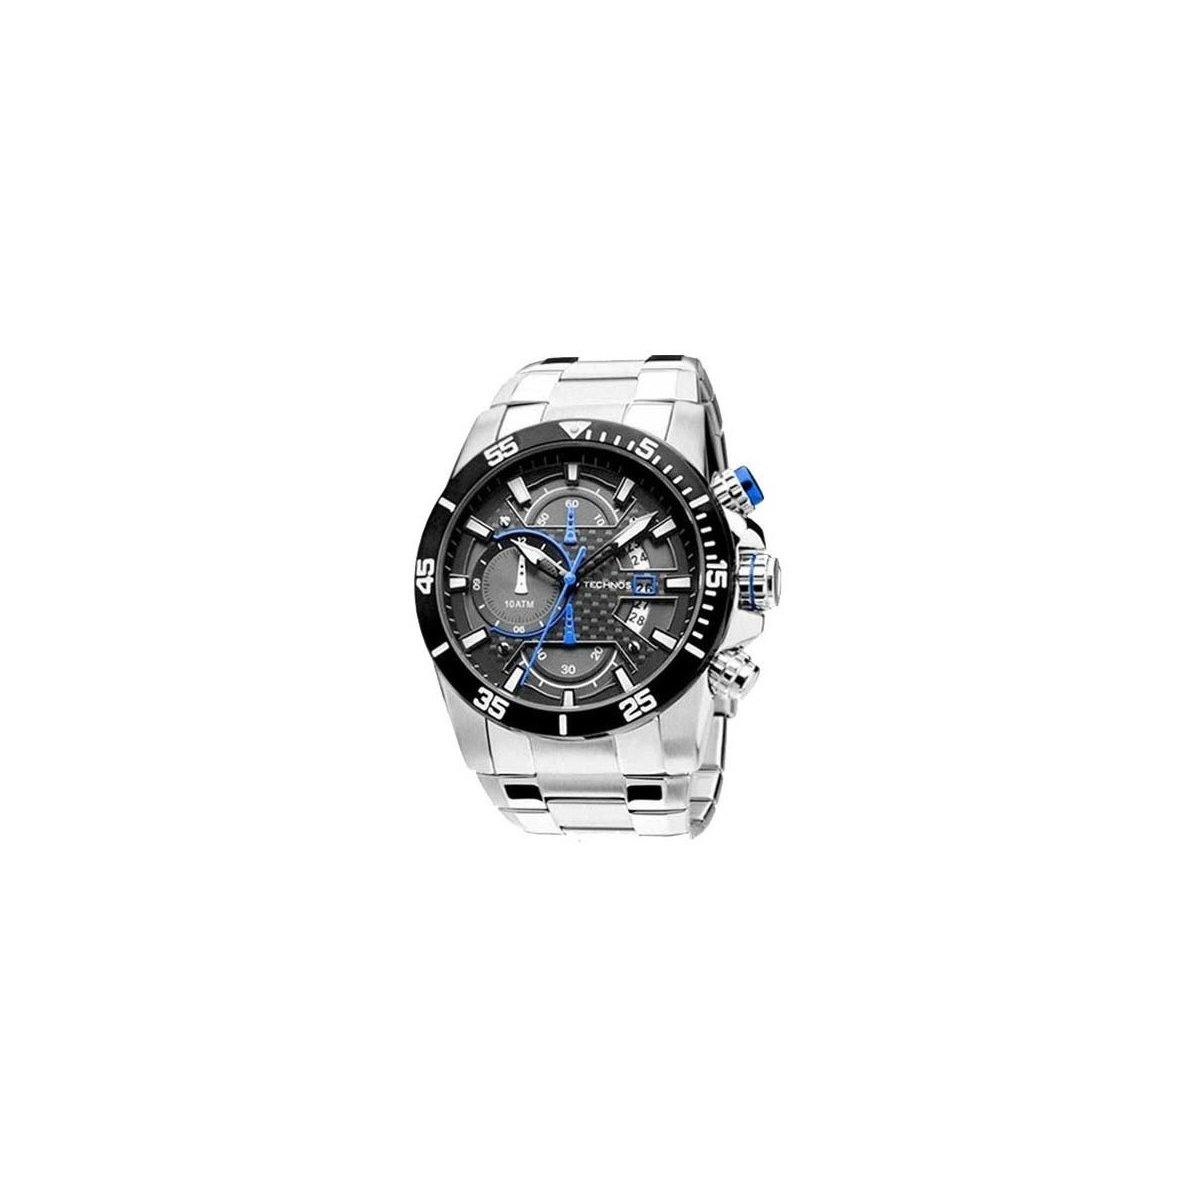 a83ecca96053a Relógio Technos Performance Os10Er 1A - Compre Agora   Netshoes